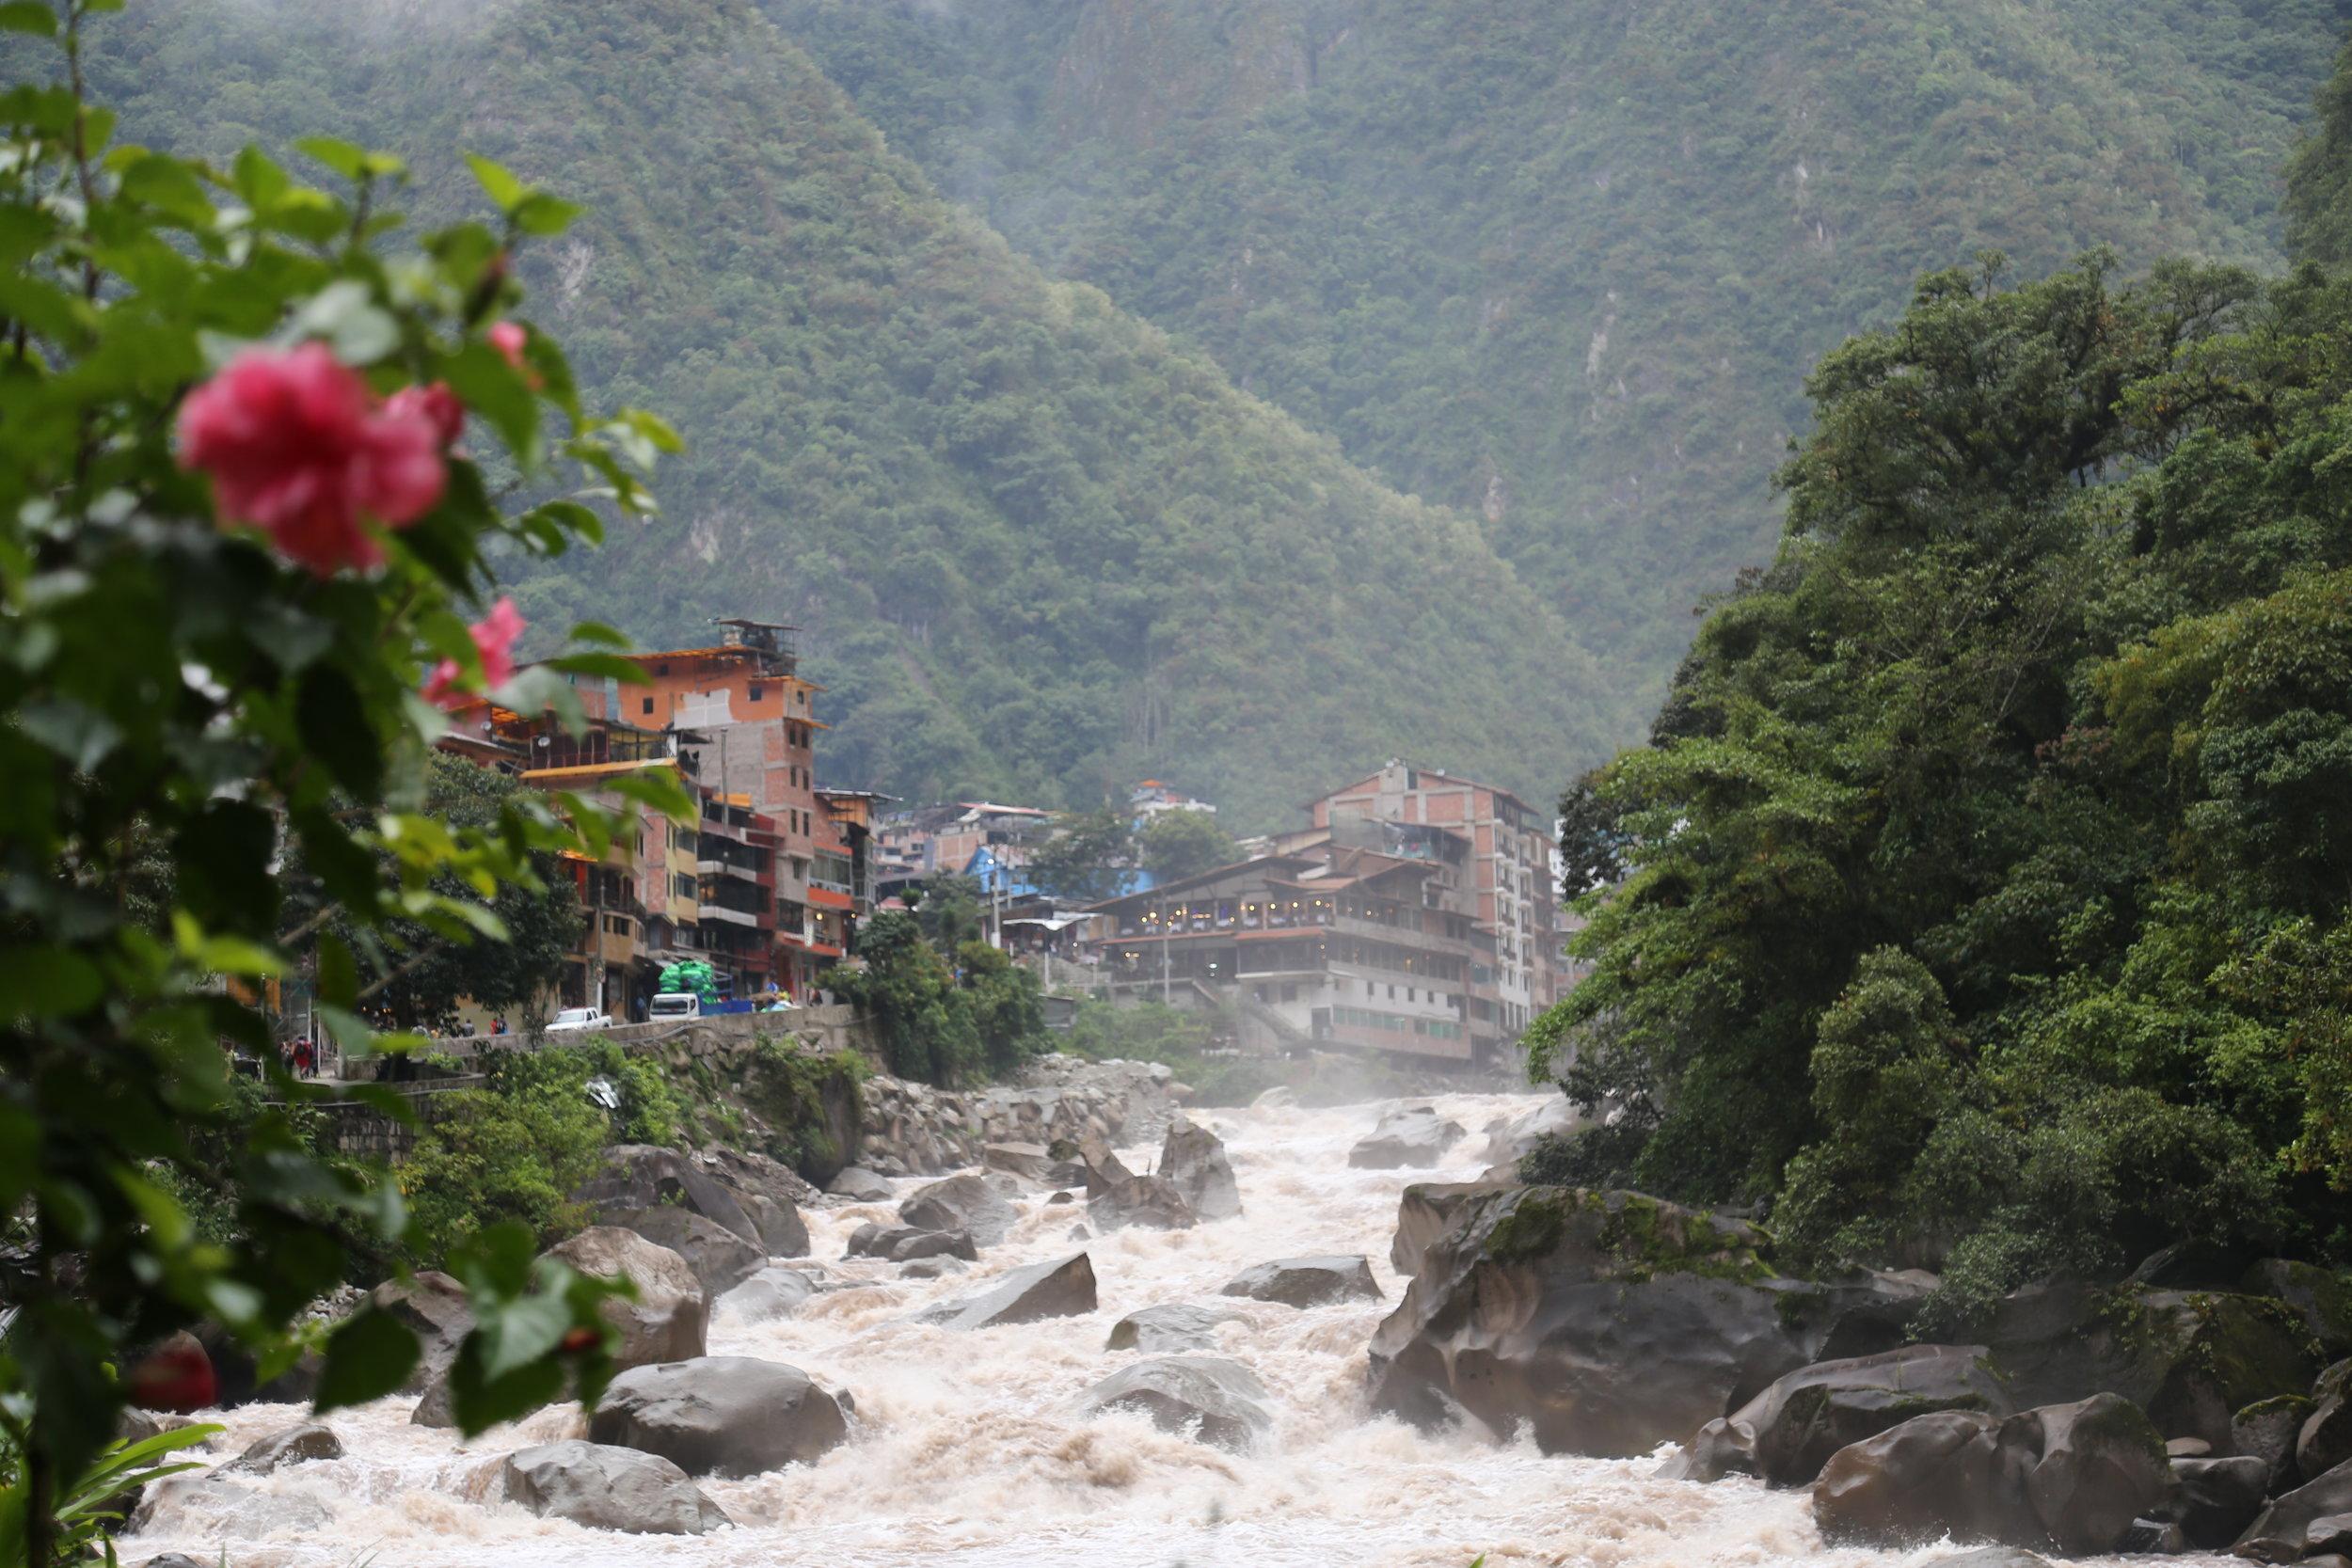 Aguas Calientes. Final resting spot until Machu Picchu. Day 3 of Salkantay Trek.